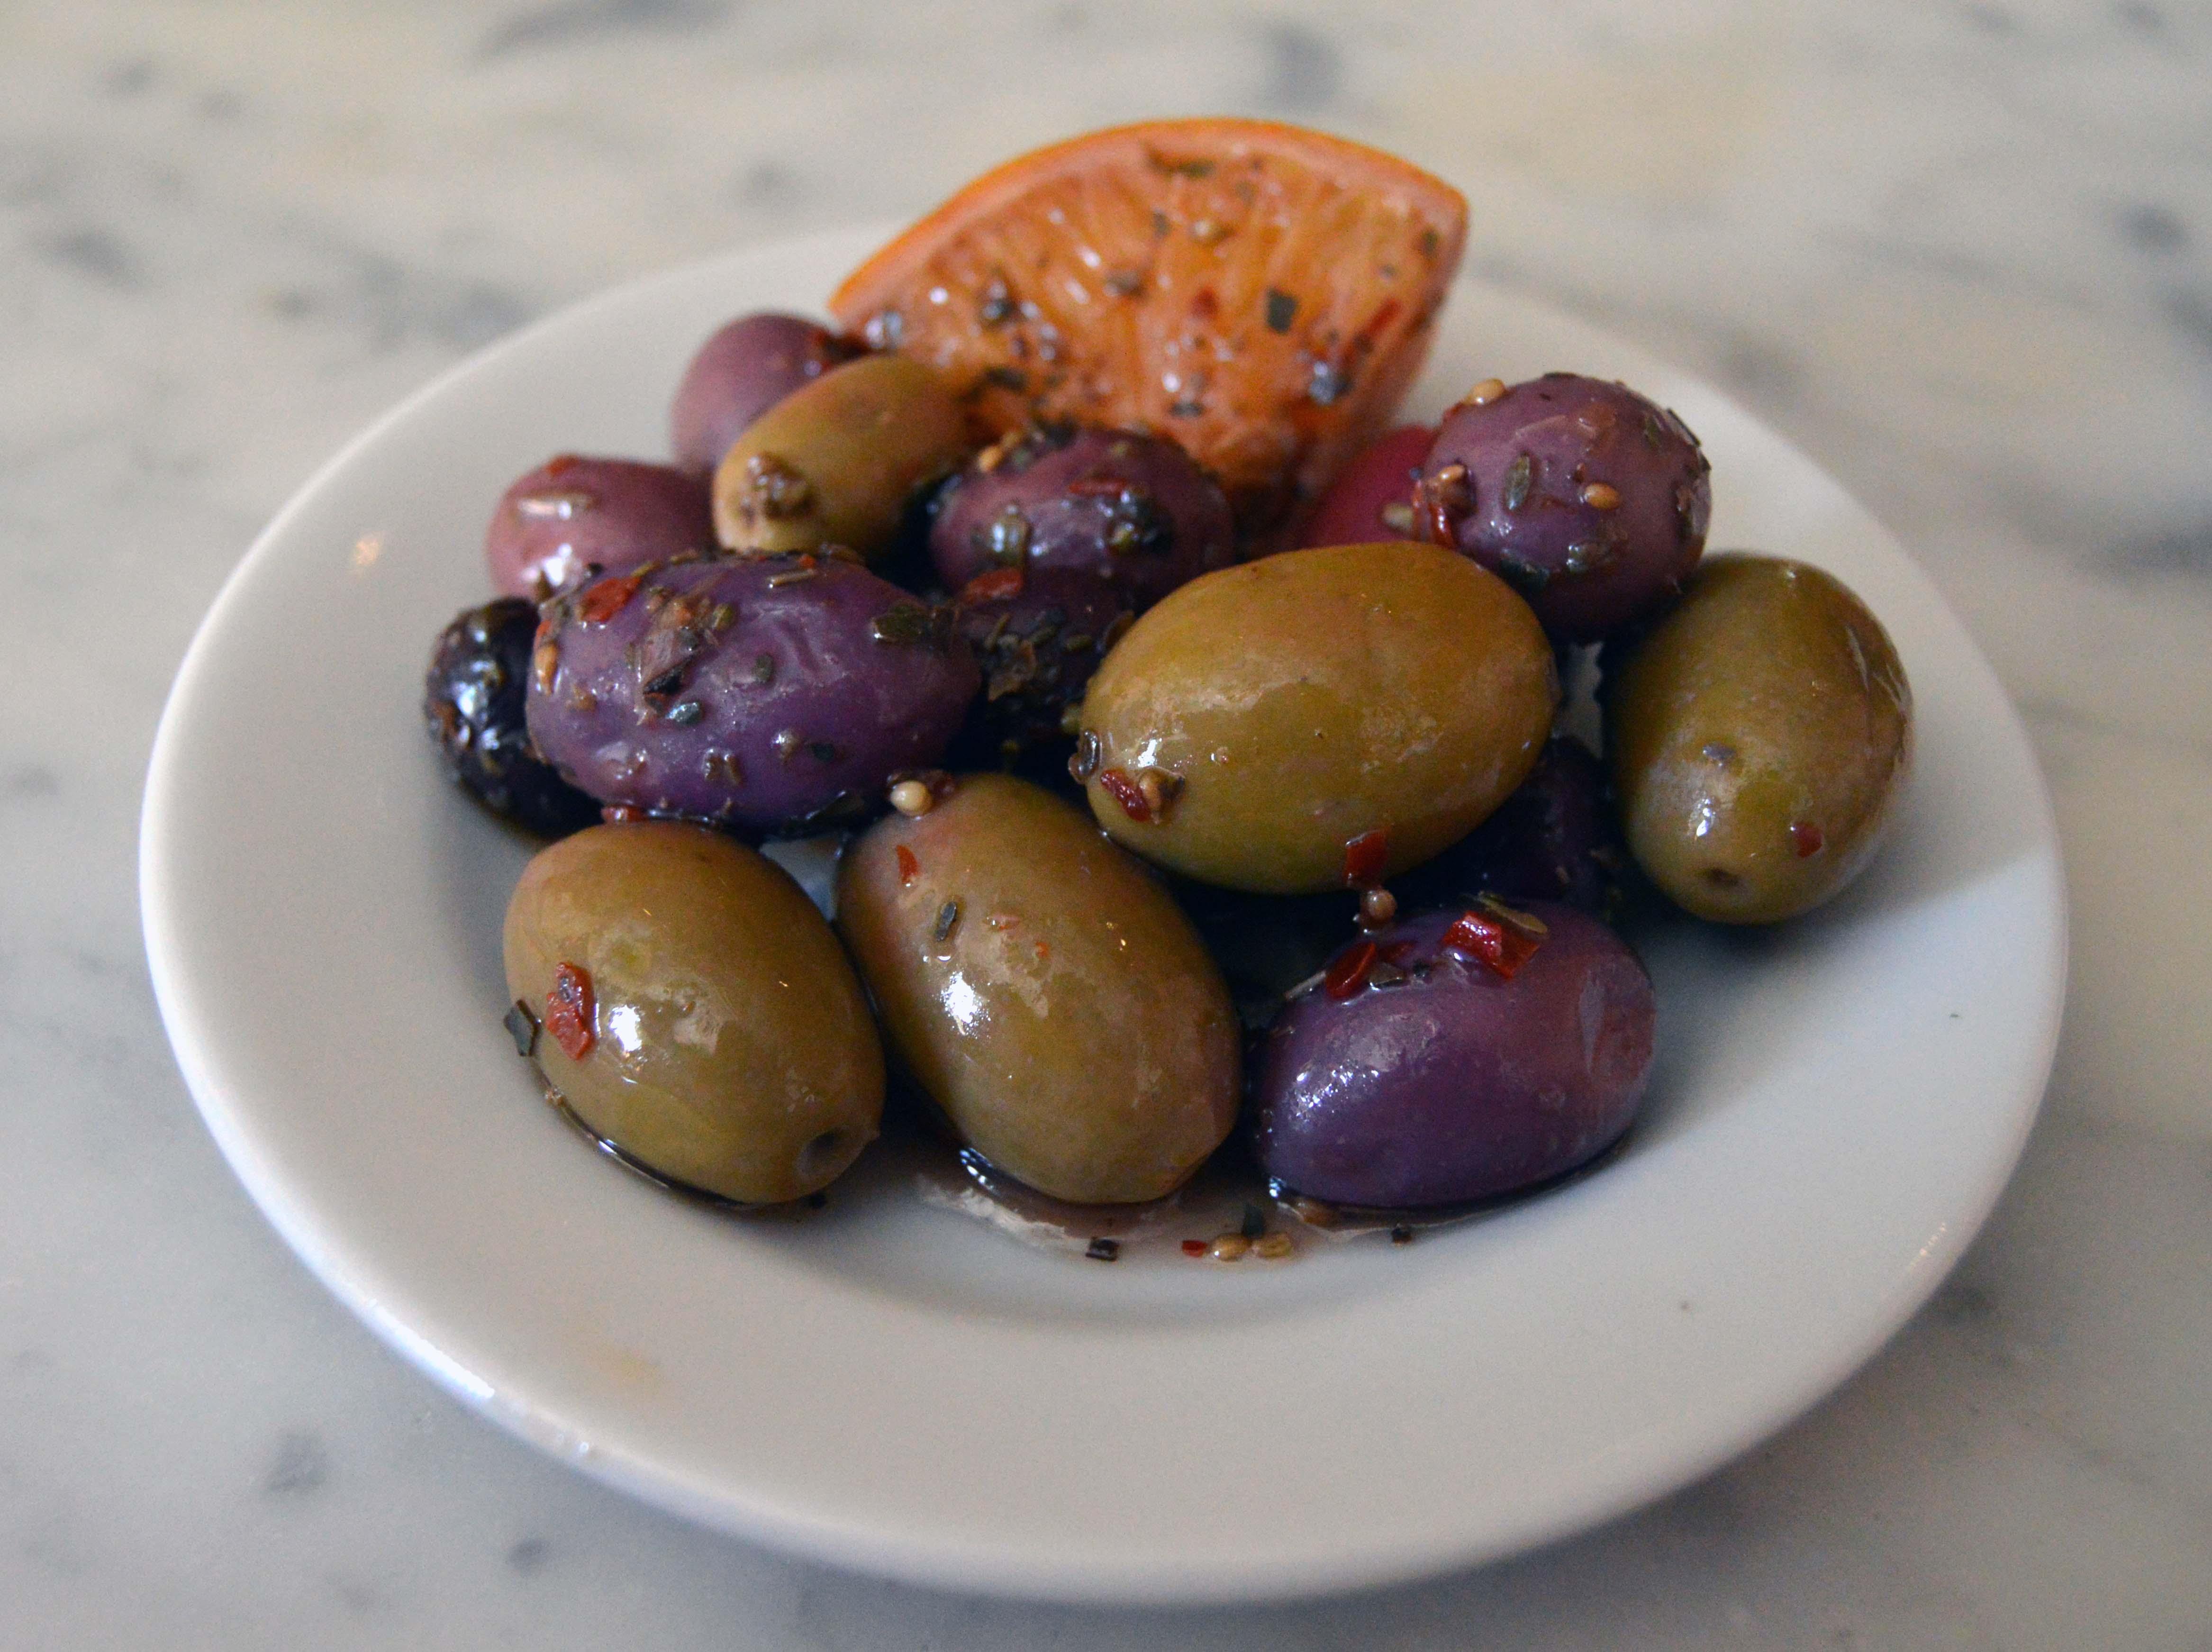 Olive Miste, marinated olives